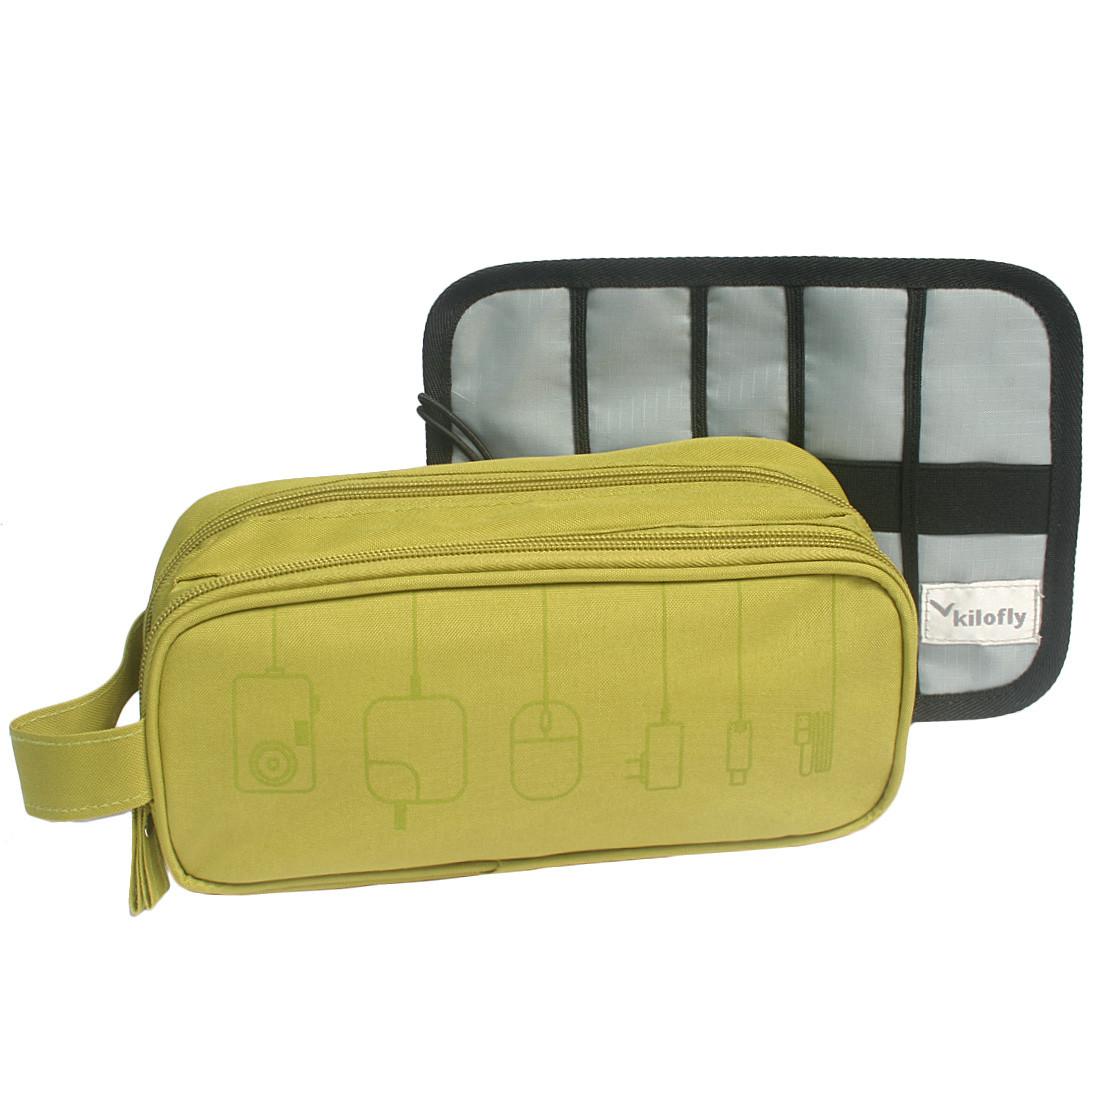 849899f602 kilofly Universal Cable Organizer Bag Roll Up Folding Travel Case (Set of  2). Loading zoom